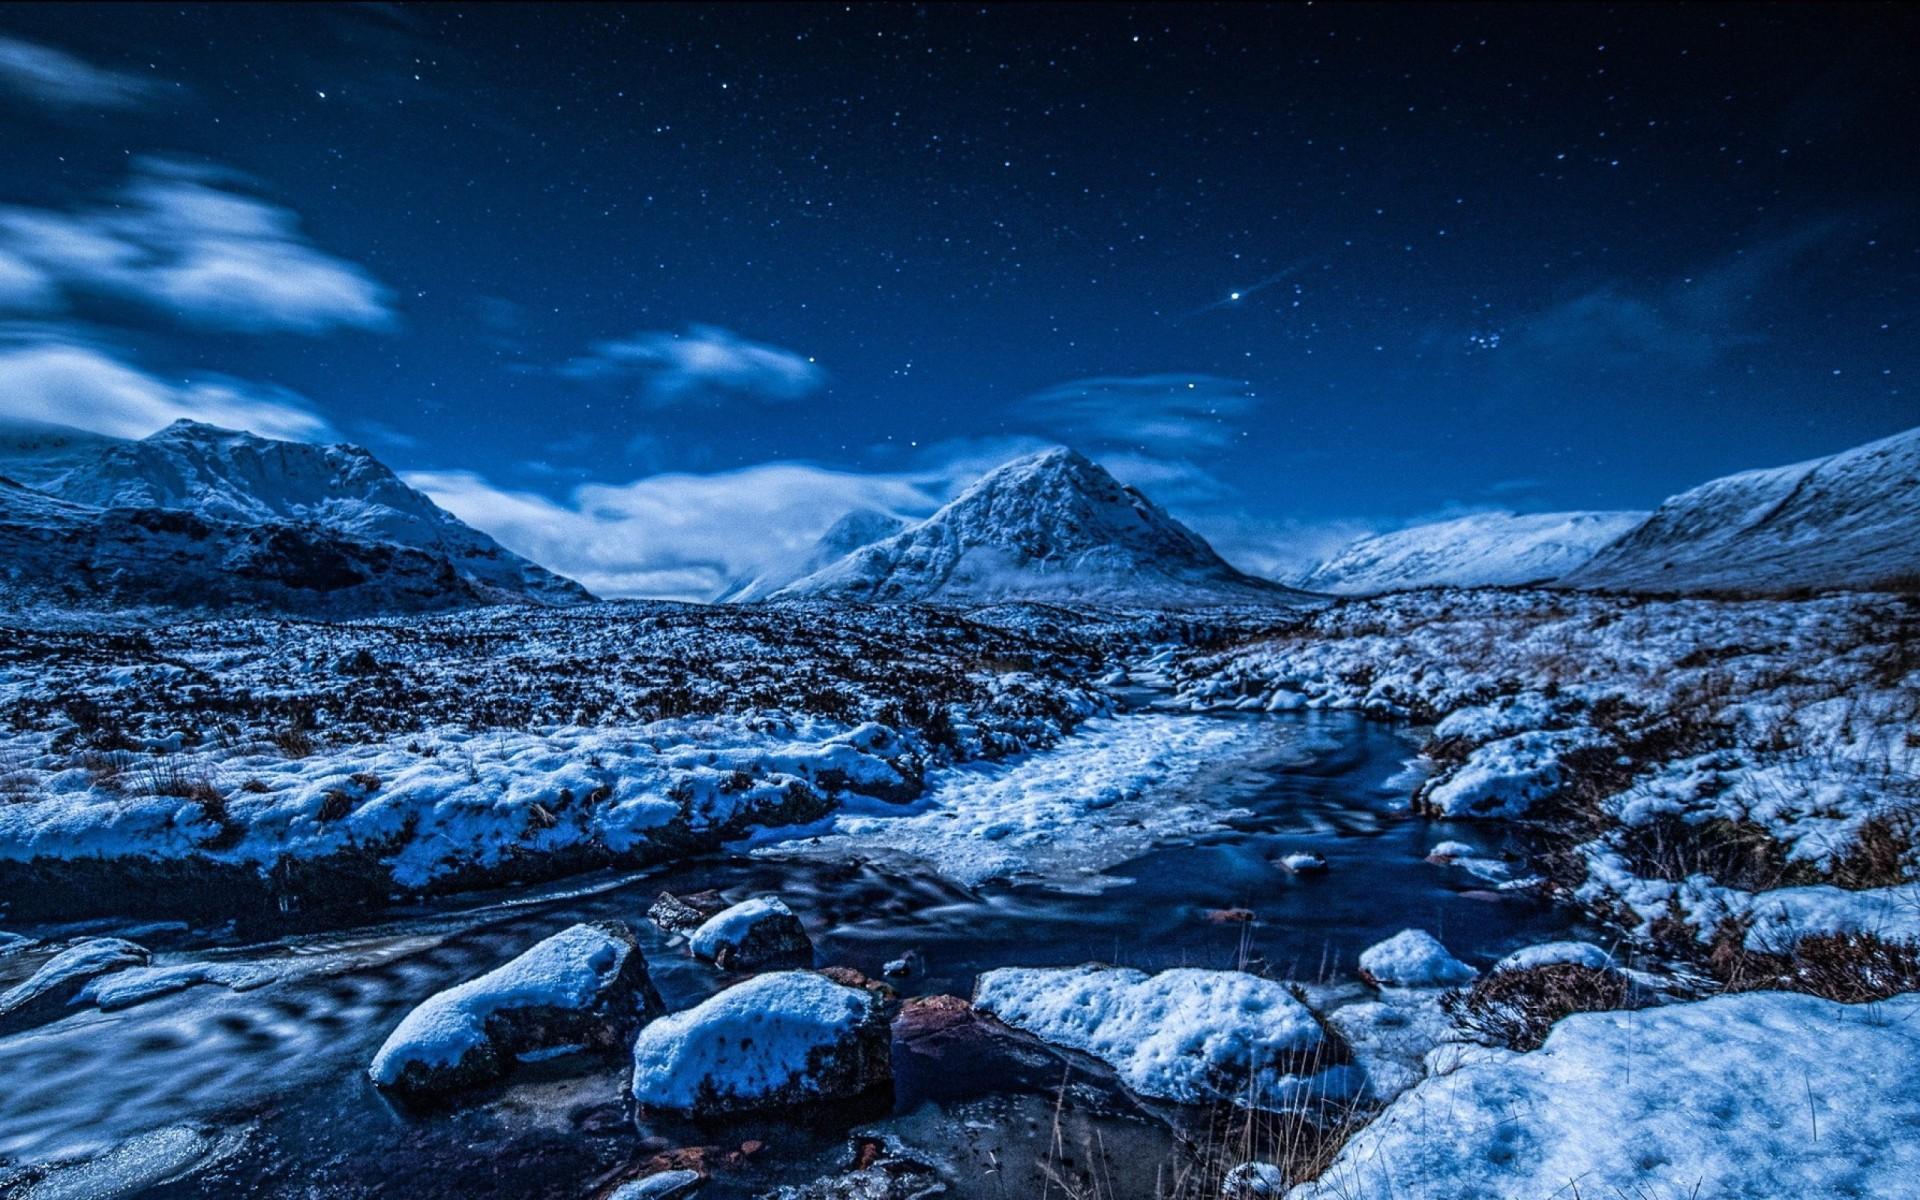 Winter Night Sky Stars HD Wallpaper